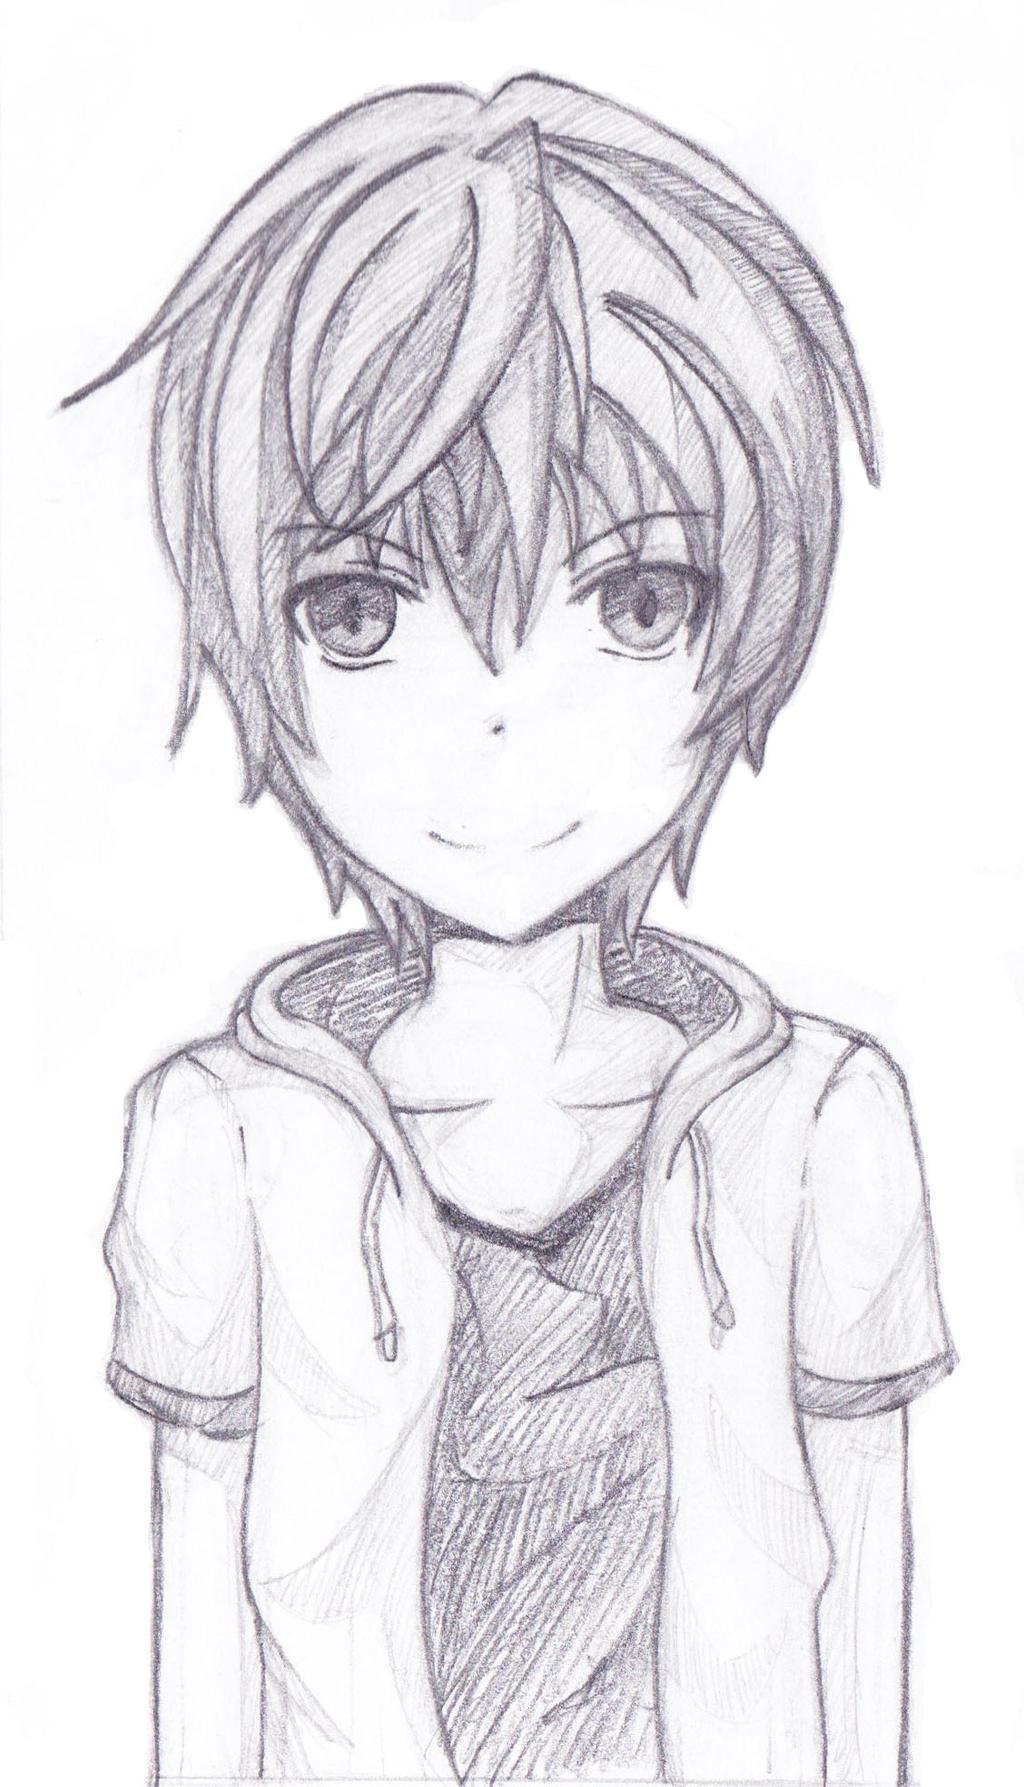 Sketch of an Anime Boy by Blazing-Skies on DeviantArt